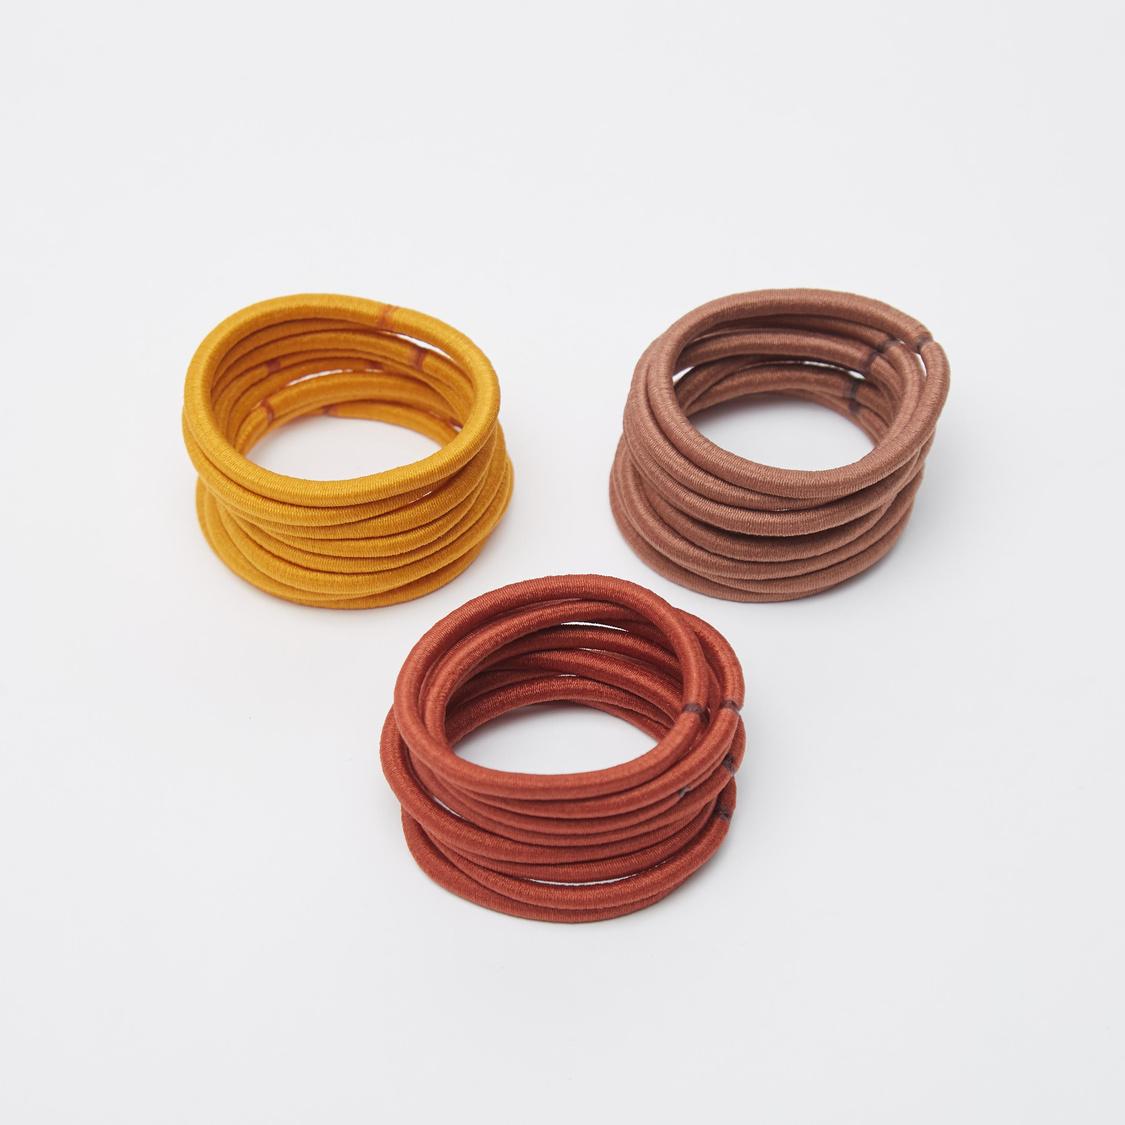 24-Piece Plain Elastic Round Bands